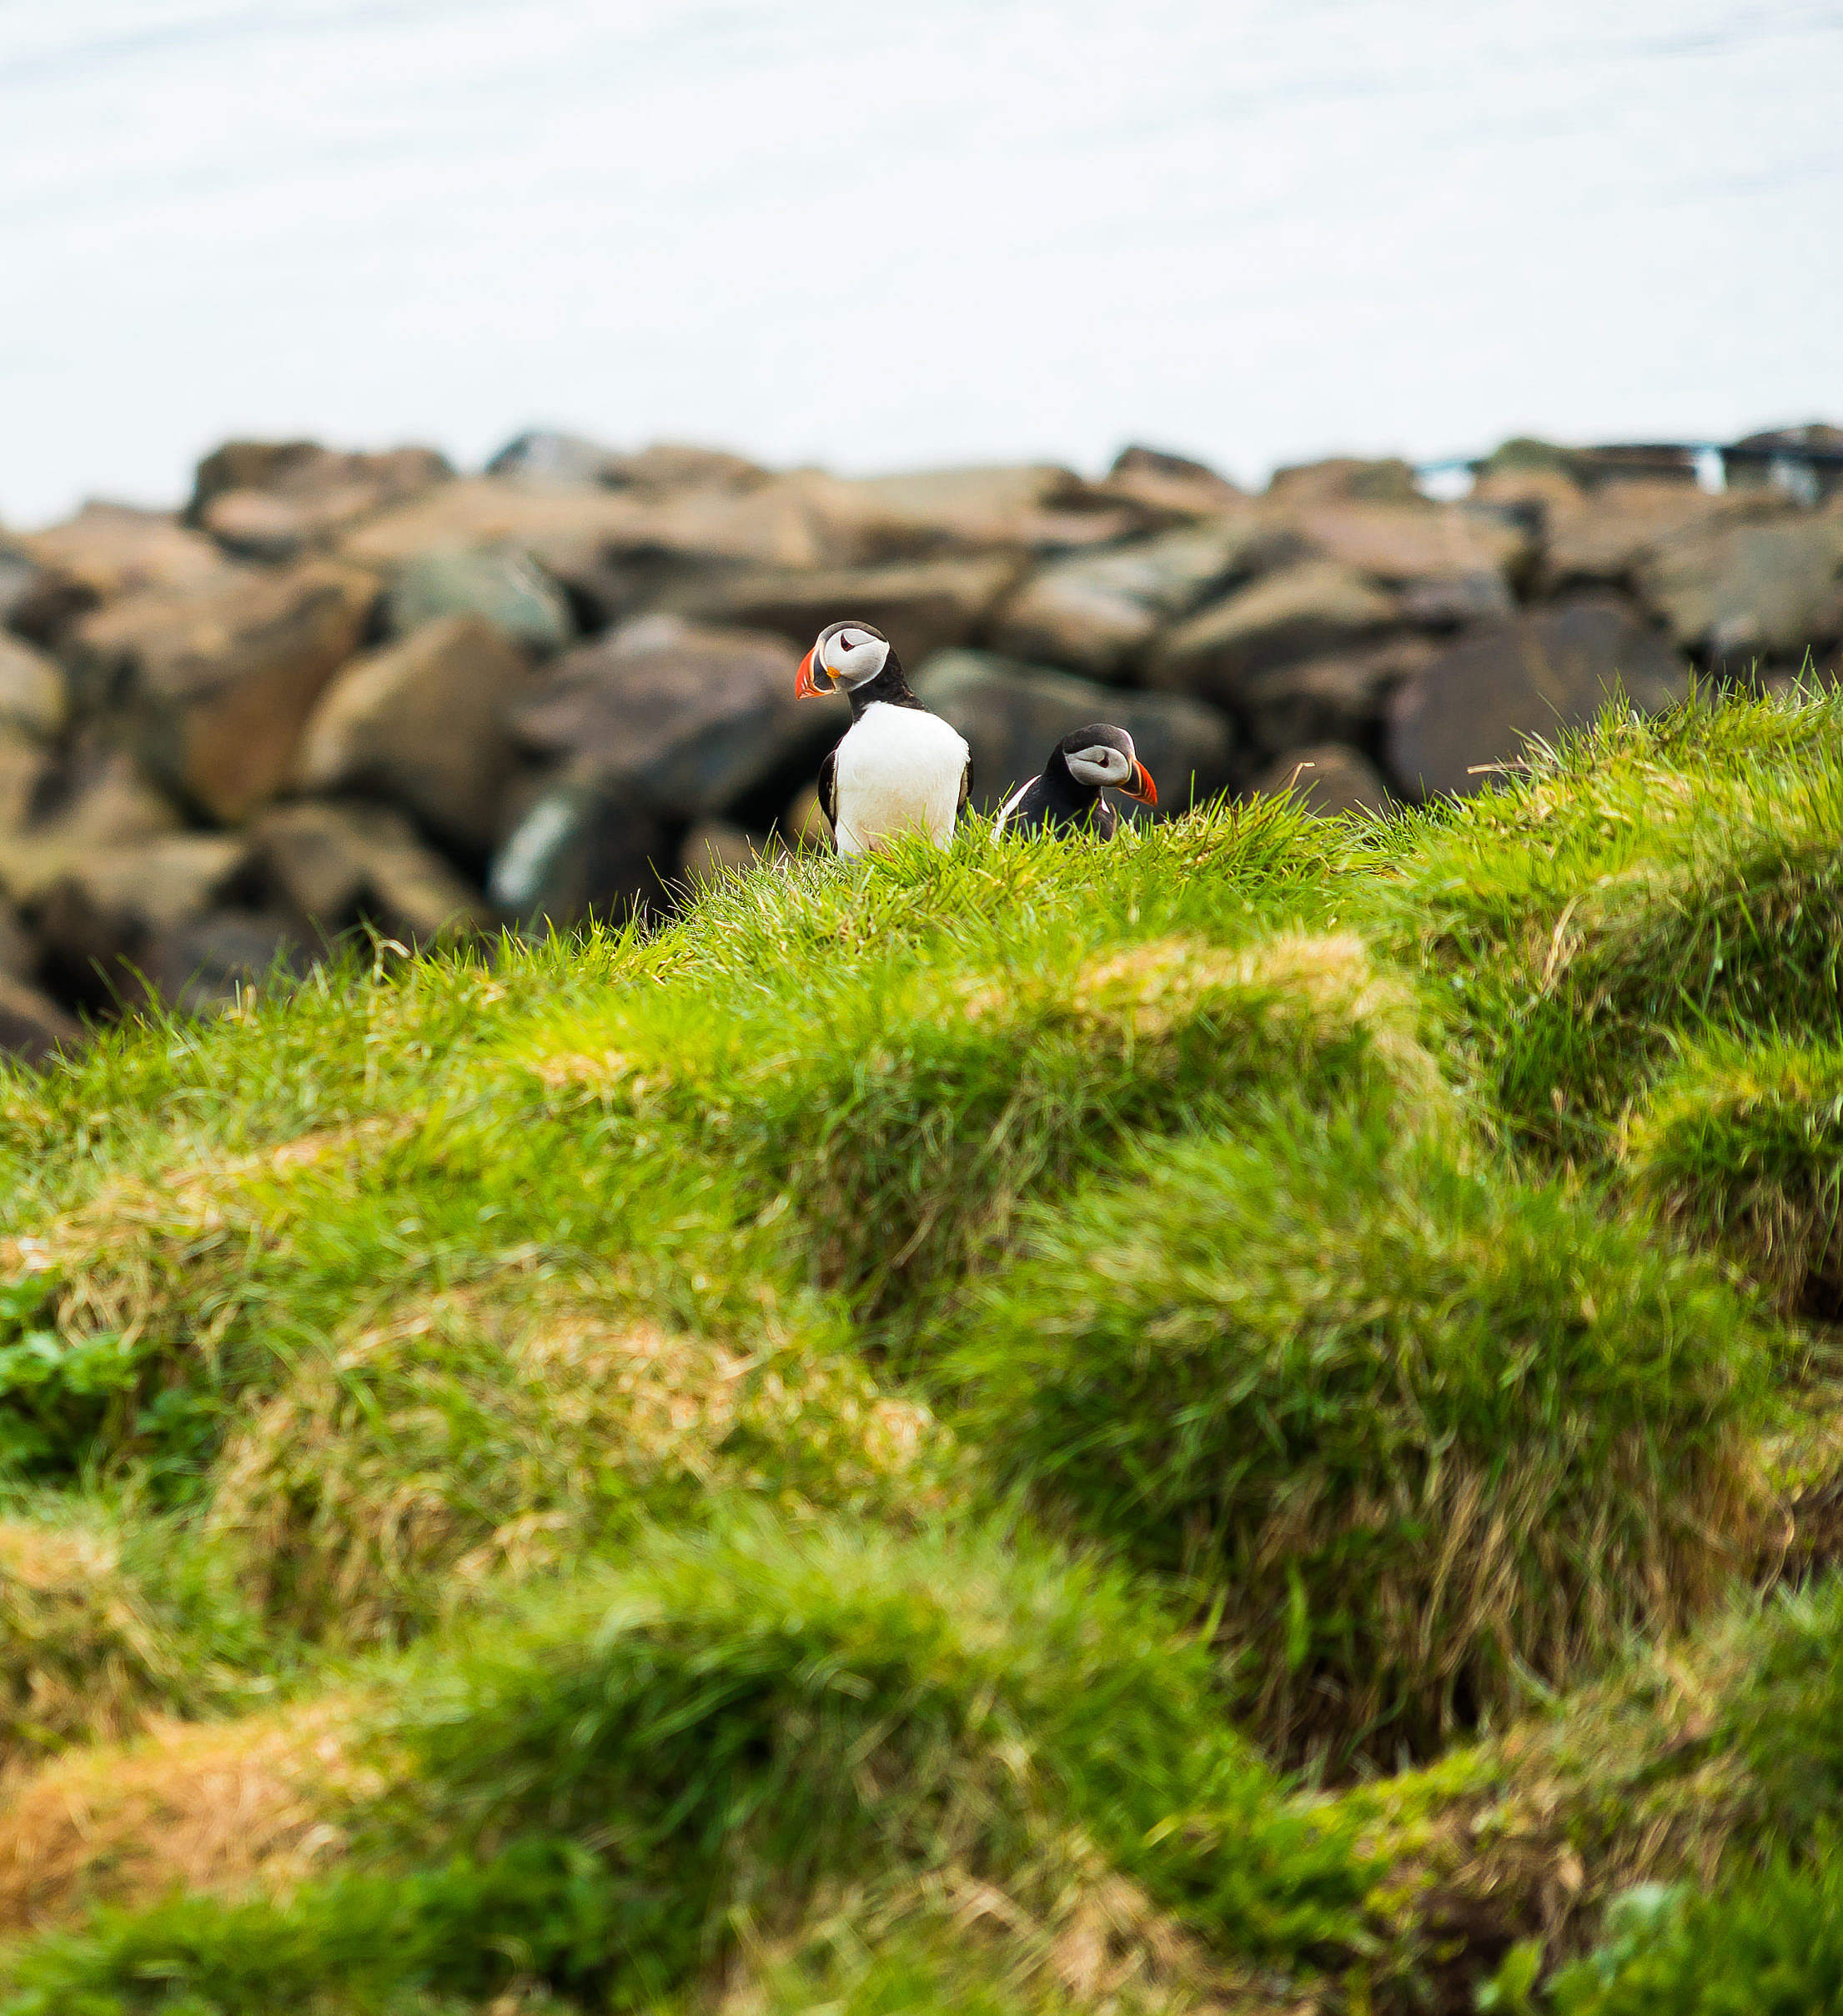 Puffins Icelandic Birds Free Stock Photo